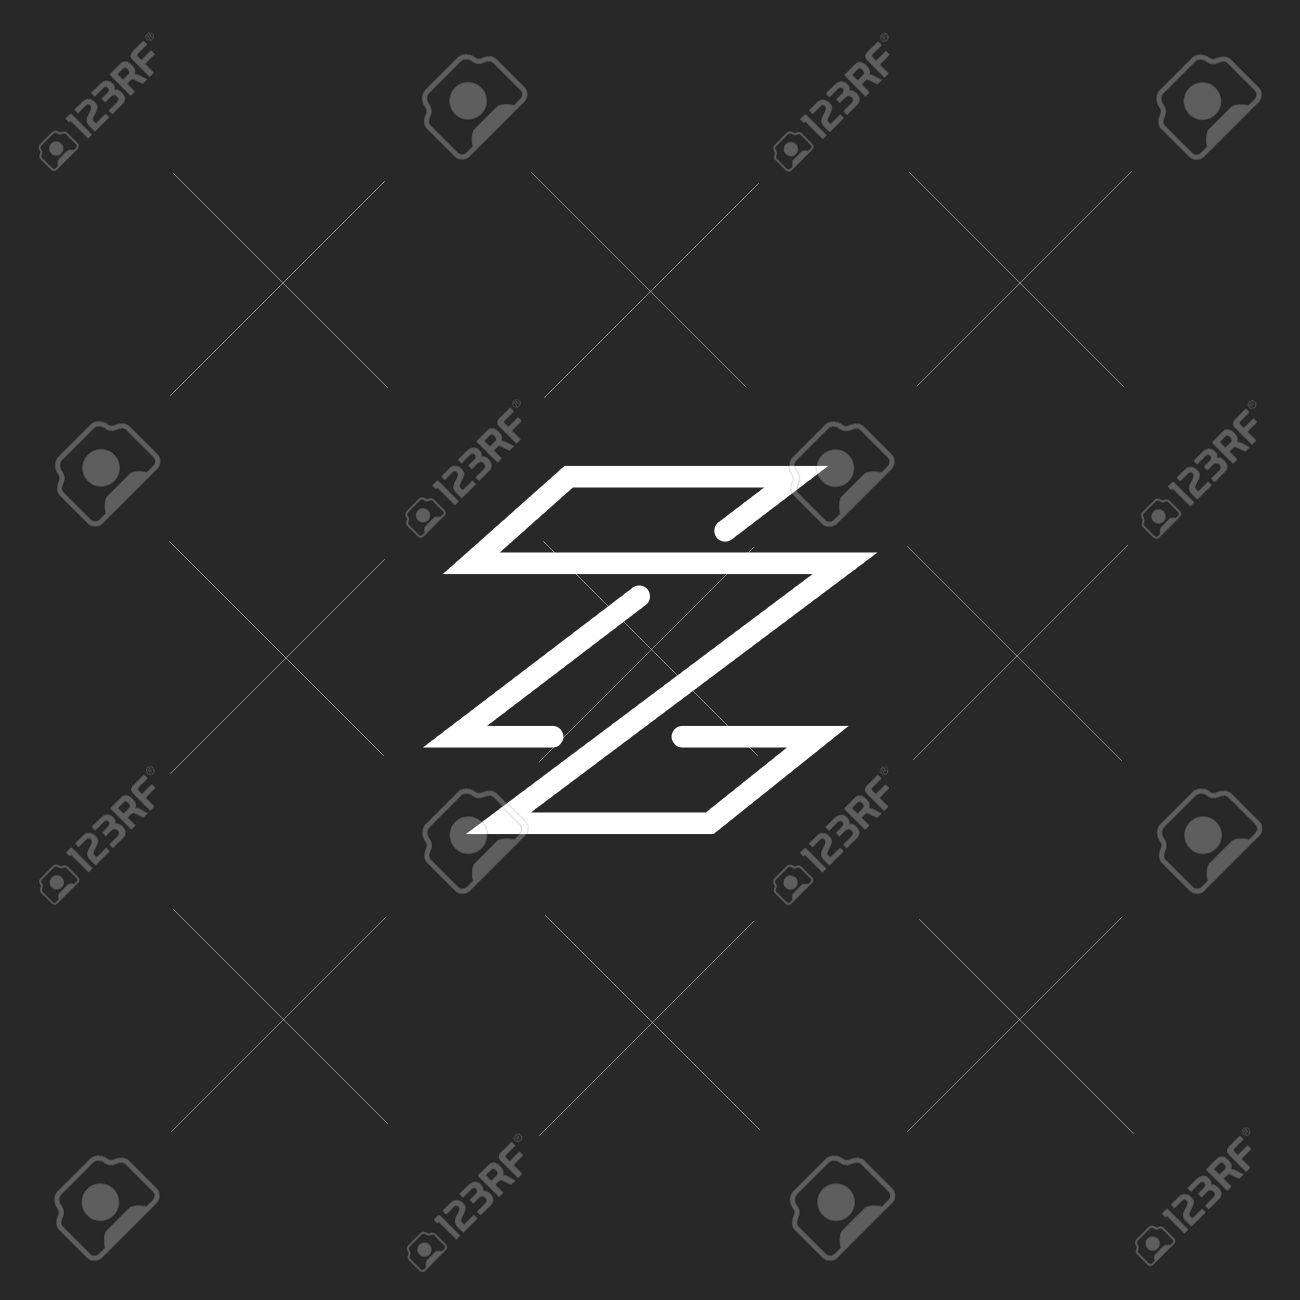 monogram letter z logo minimal style weaving thin line template emblem stock vector 49221597